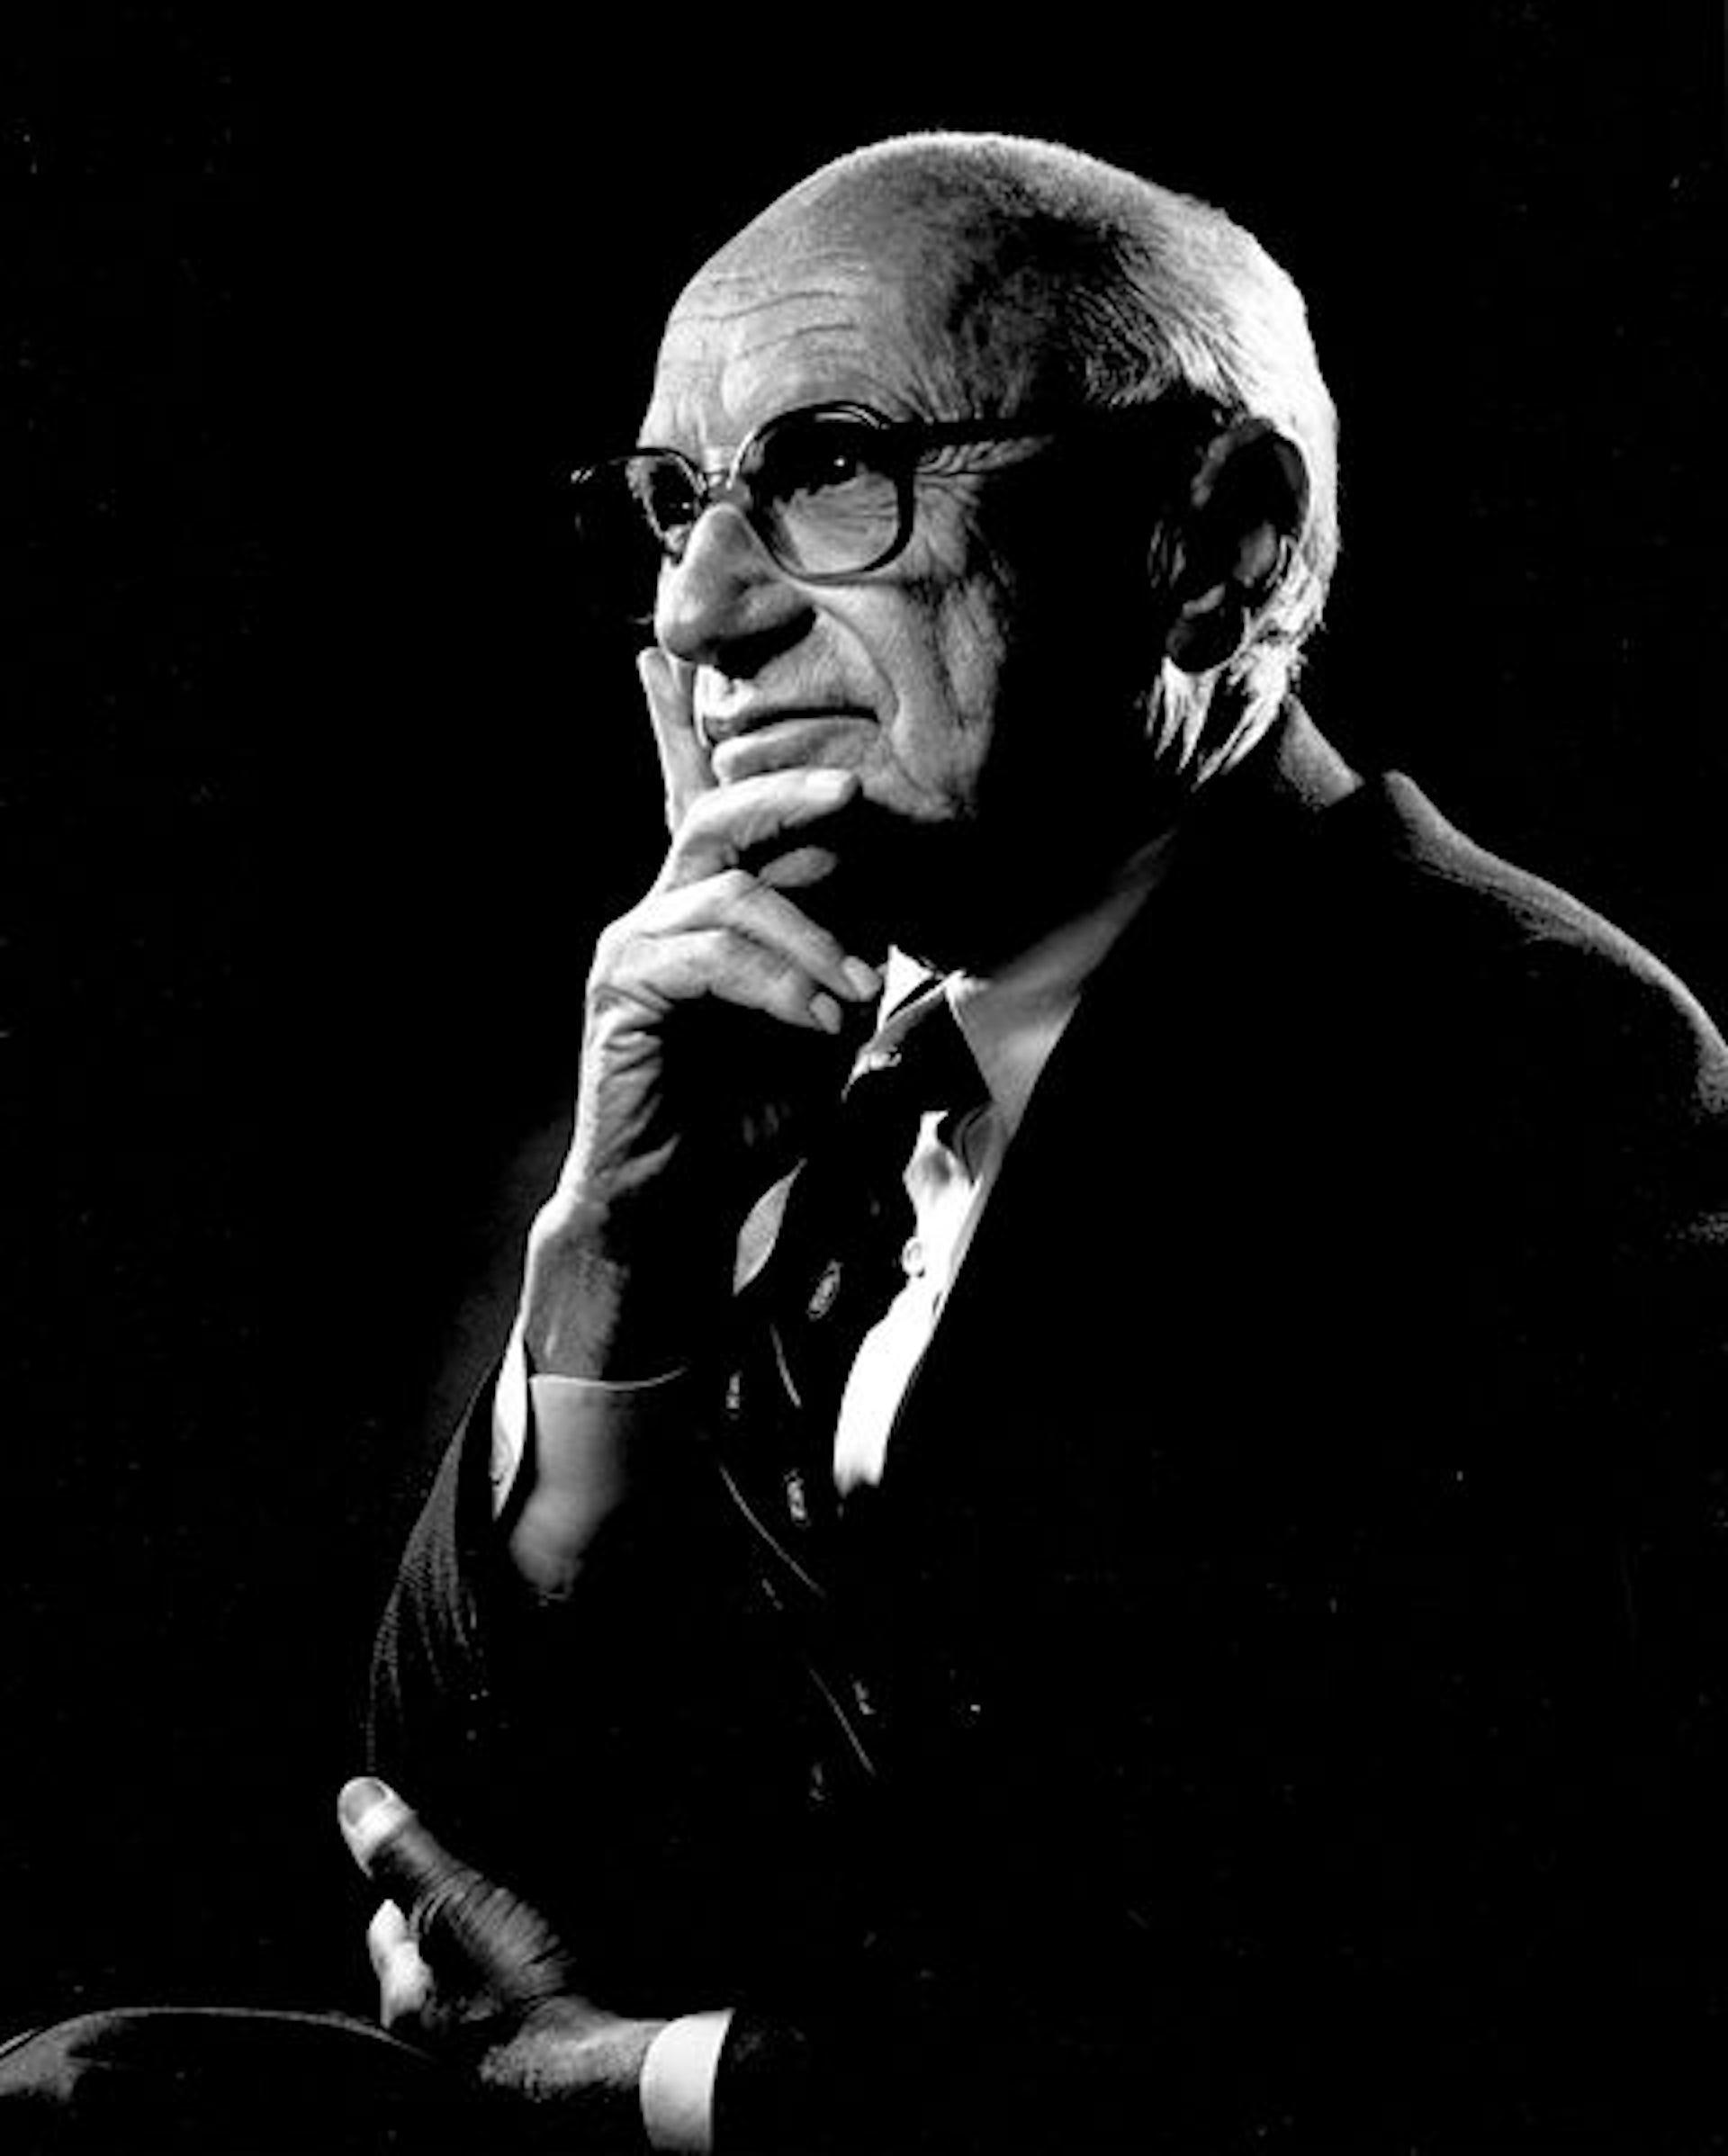 Milton Friedman, en 2004. RobertHannah89/Wikimedia, CC BY